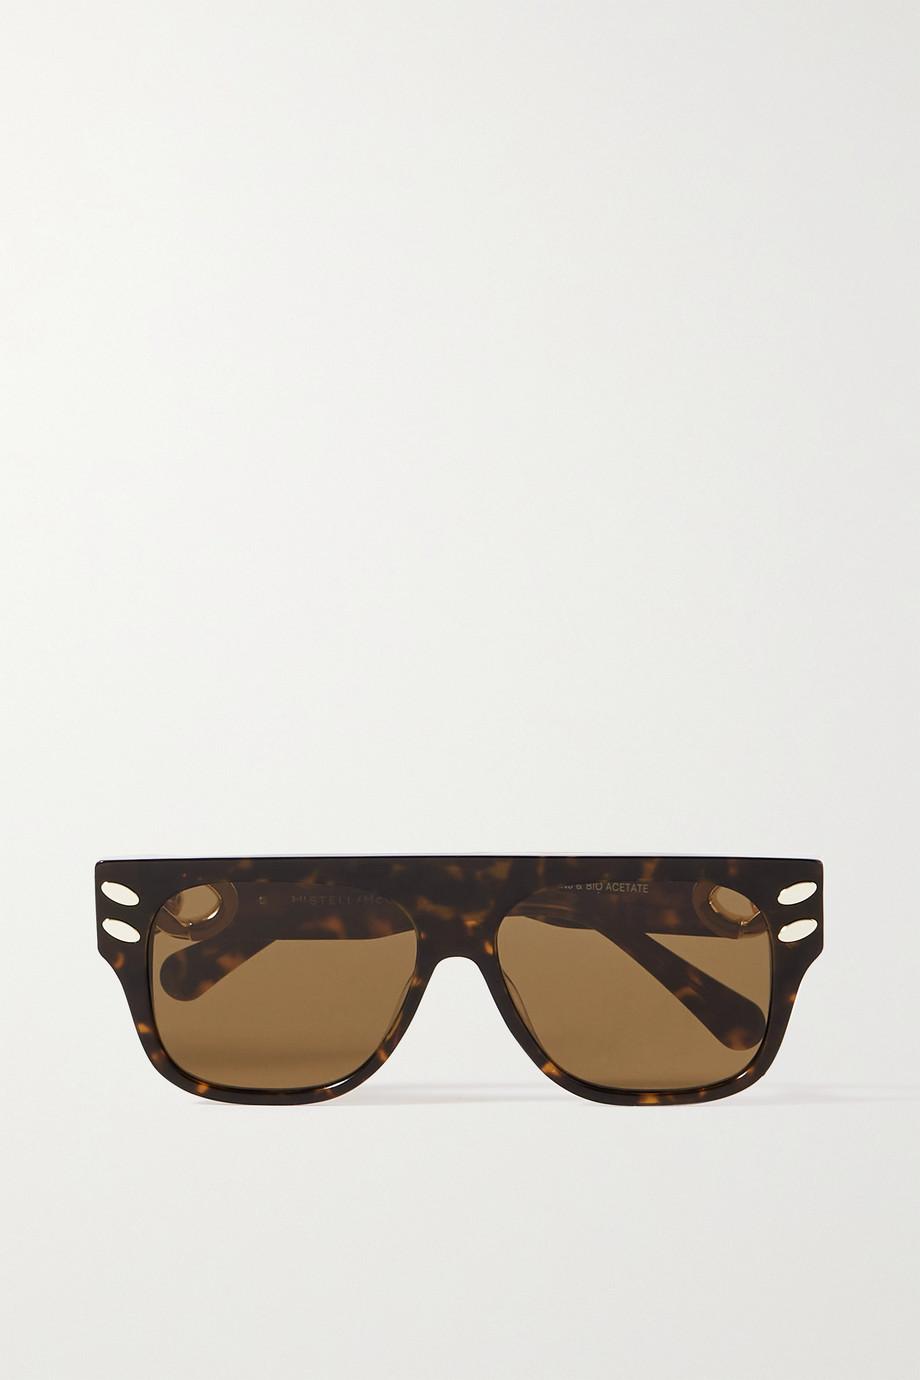 Stella McCartney The Falabella D-frame tortoiseshell acetate sunglasses